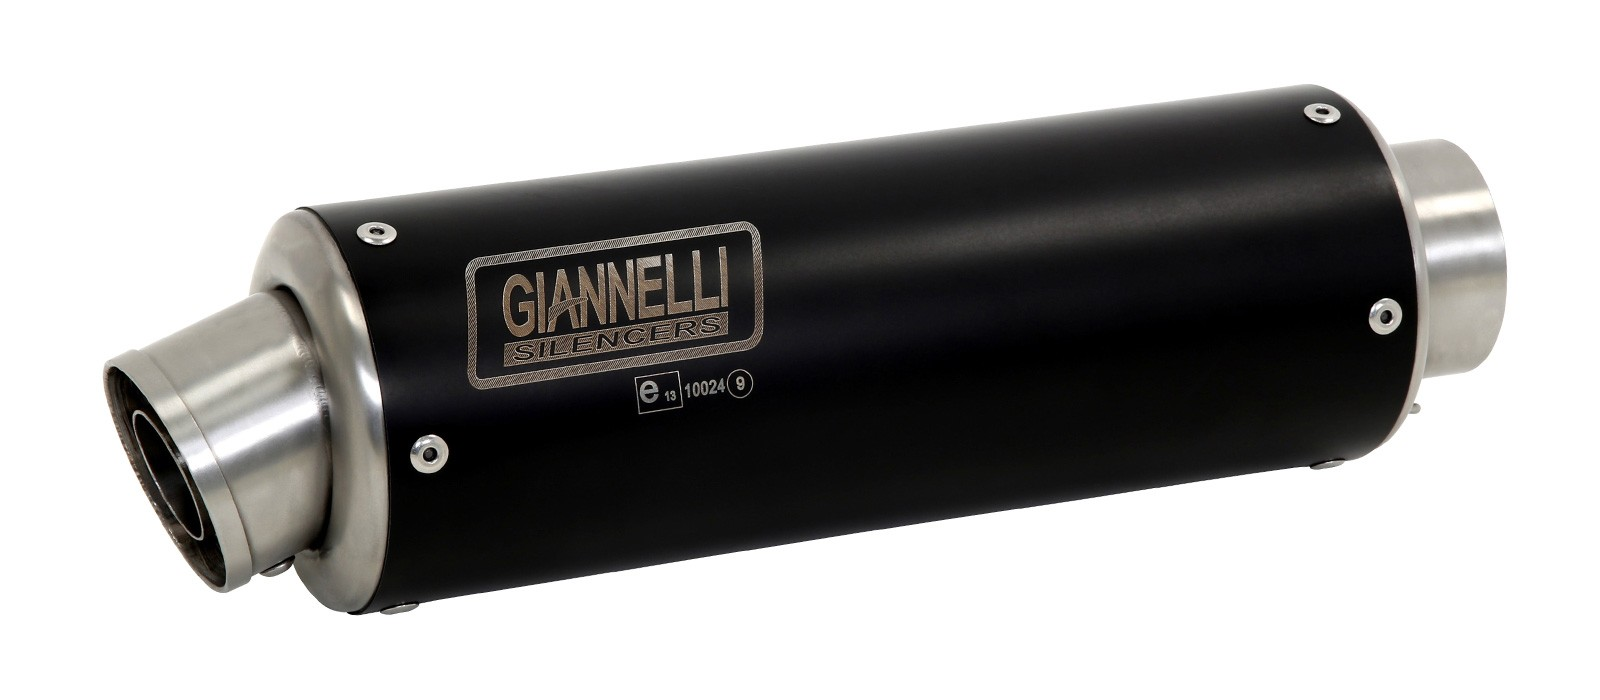 ESCAPES GIANNELLI KAWASAKI - Slip-on nicrom black X-PRO Kawasaki NINJA 250/300 Giannelli 73515XP -